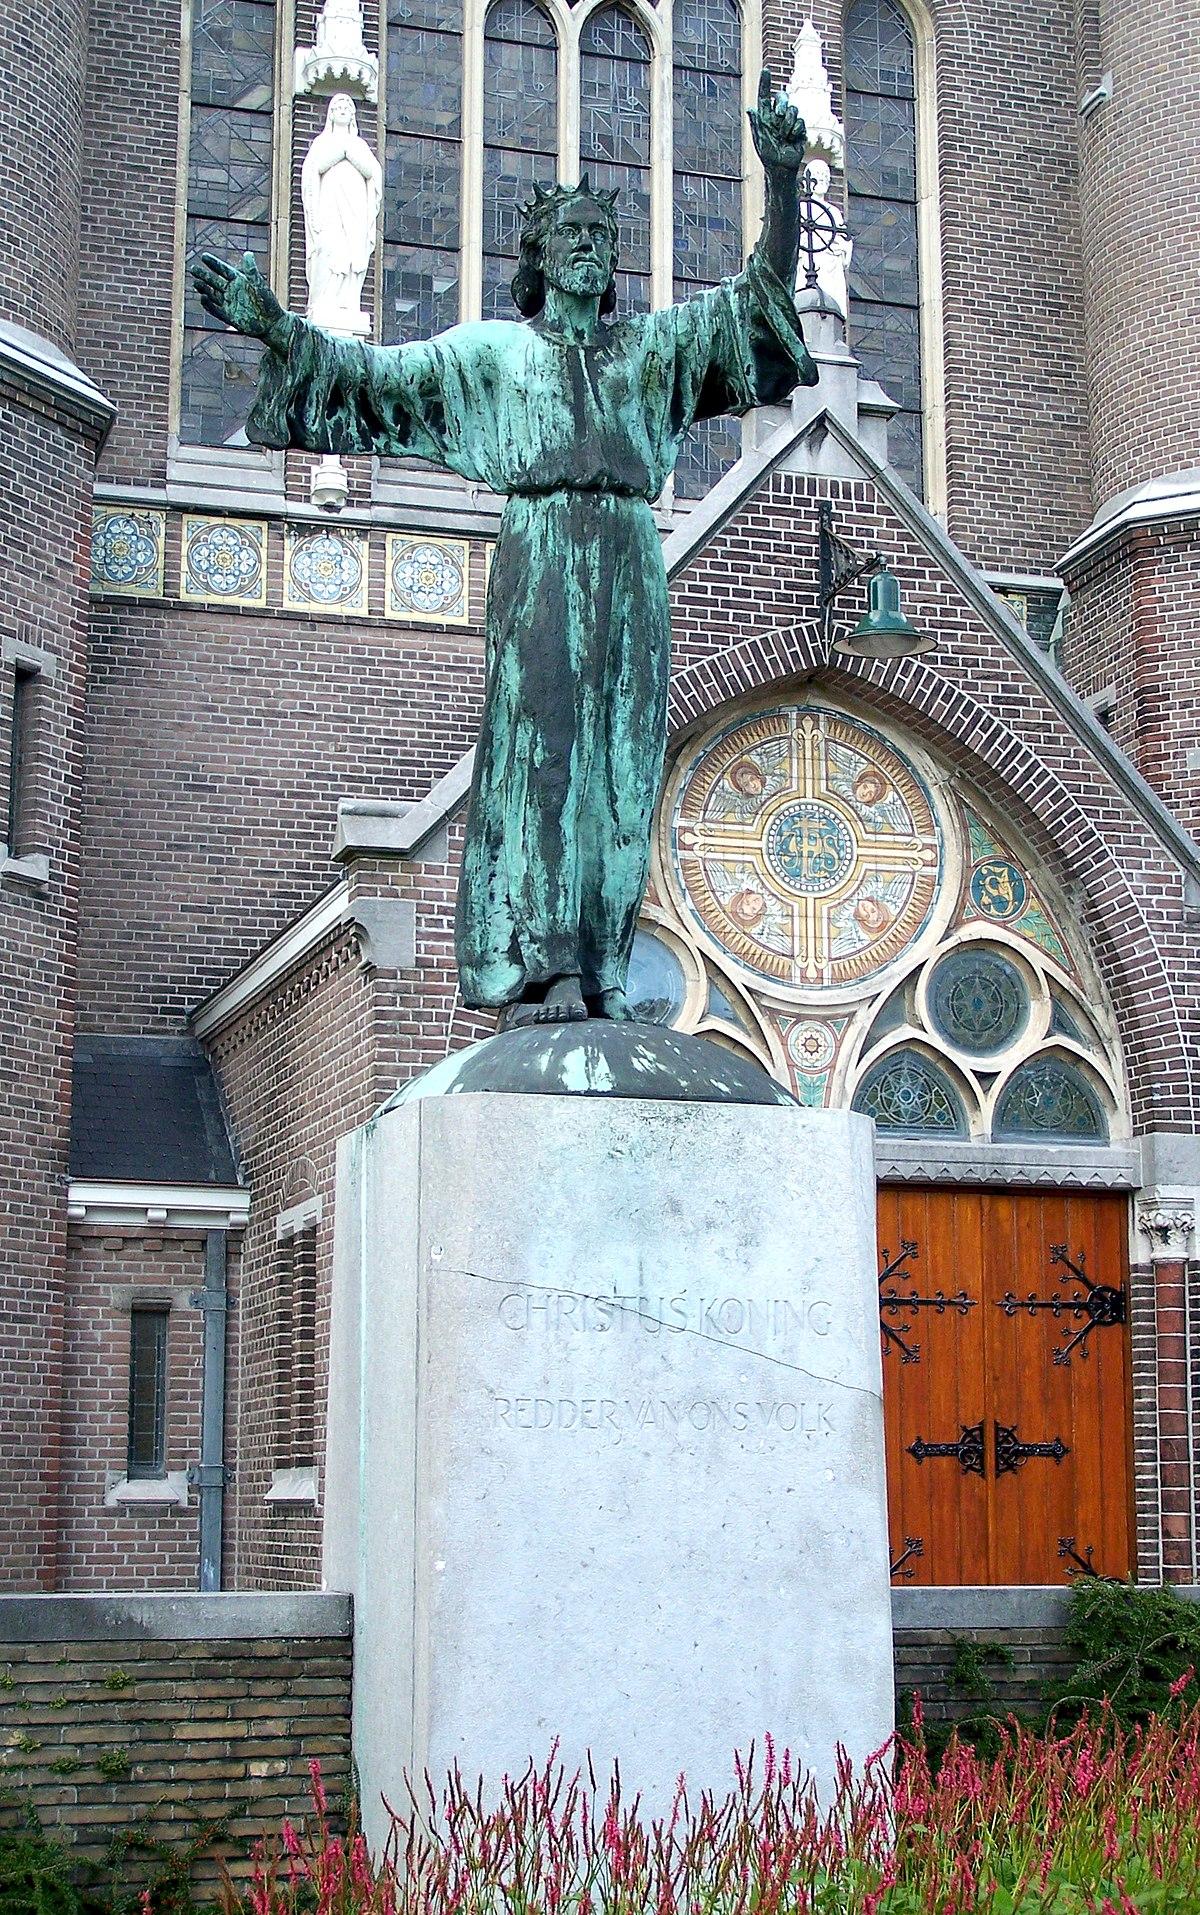 Christus Koning Alkmaar  Wikipedia